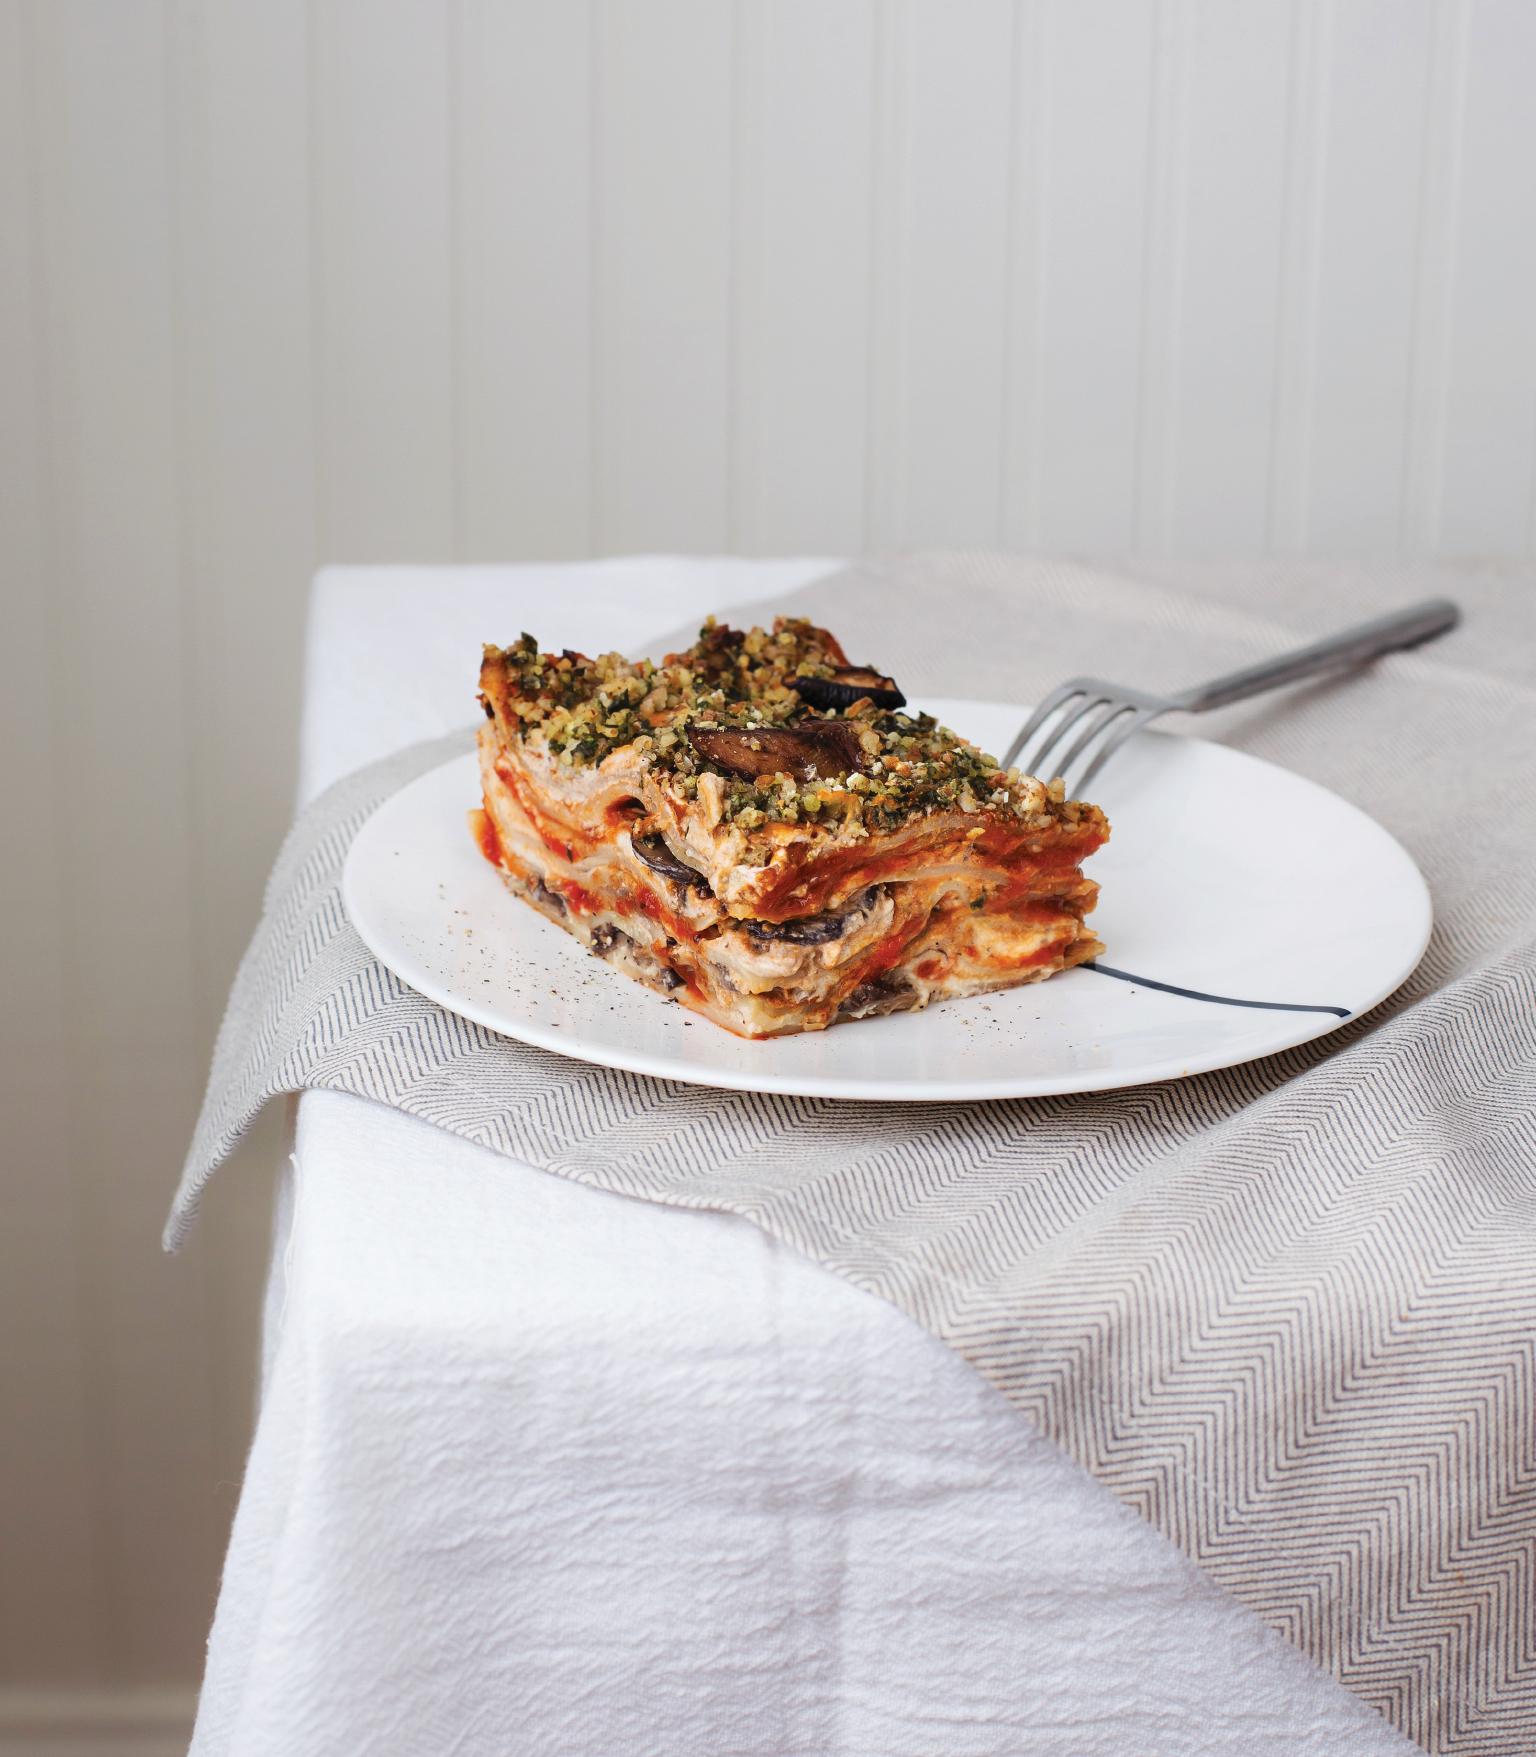 Savory Mushroom & Sage Lasagna with Cashew Cream